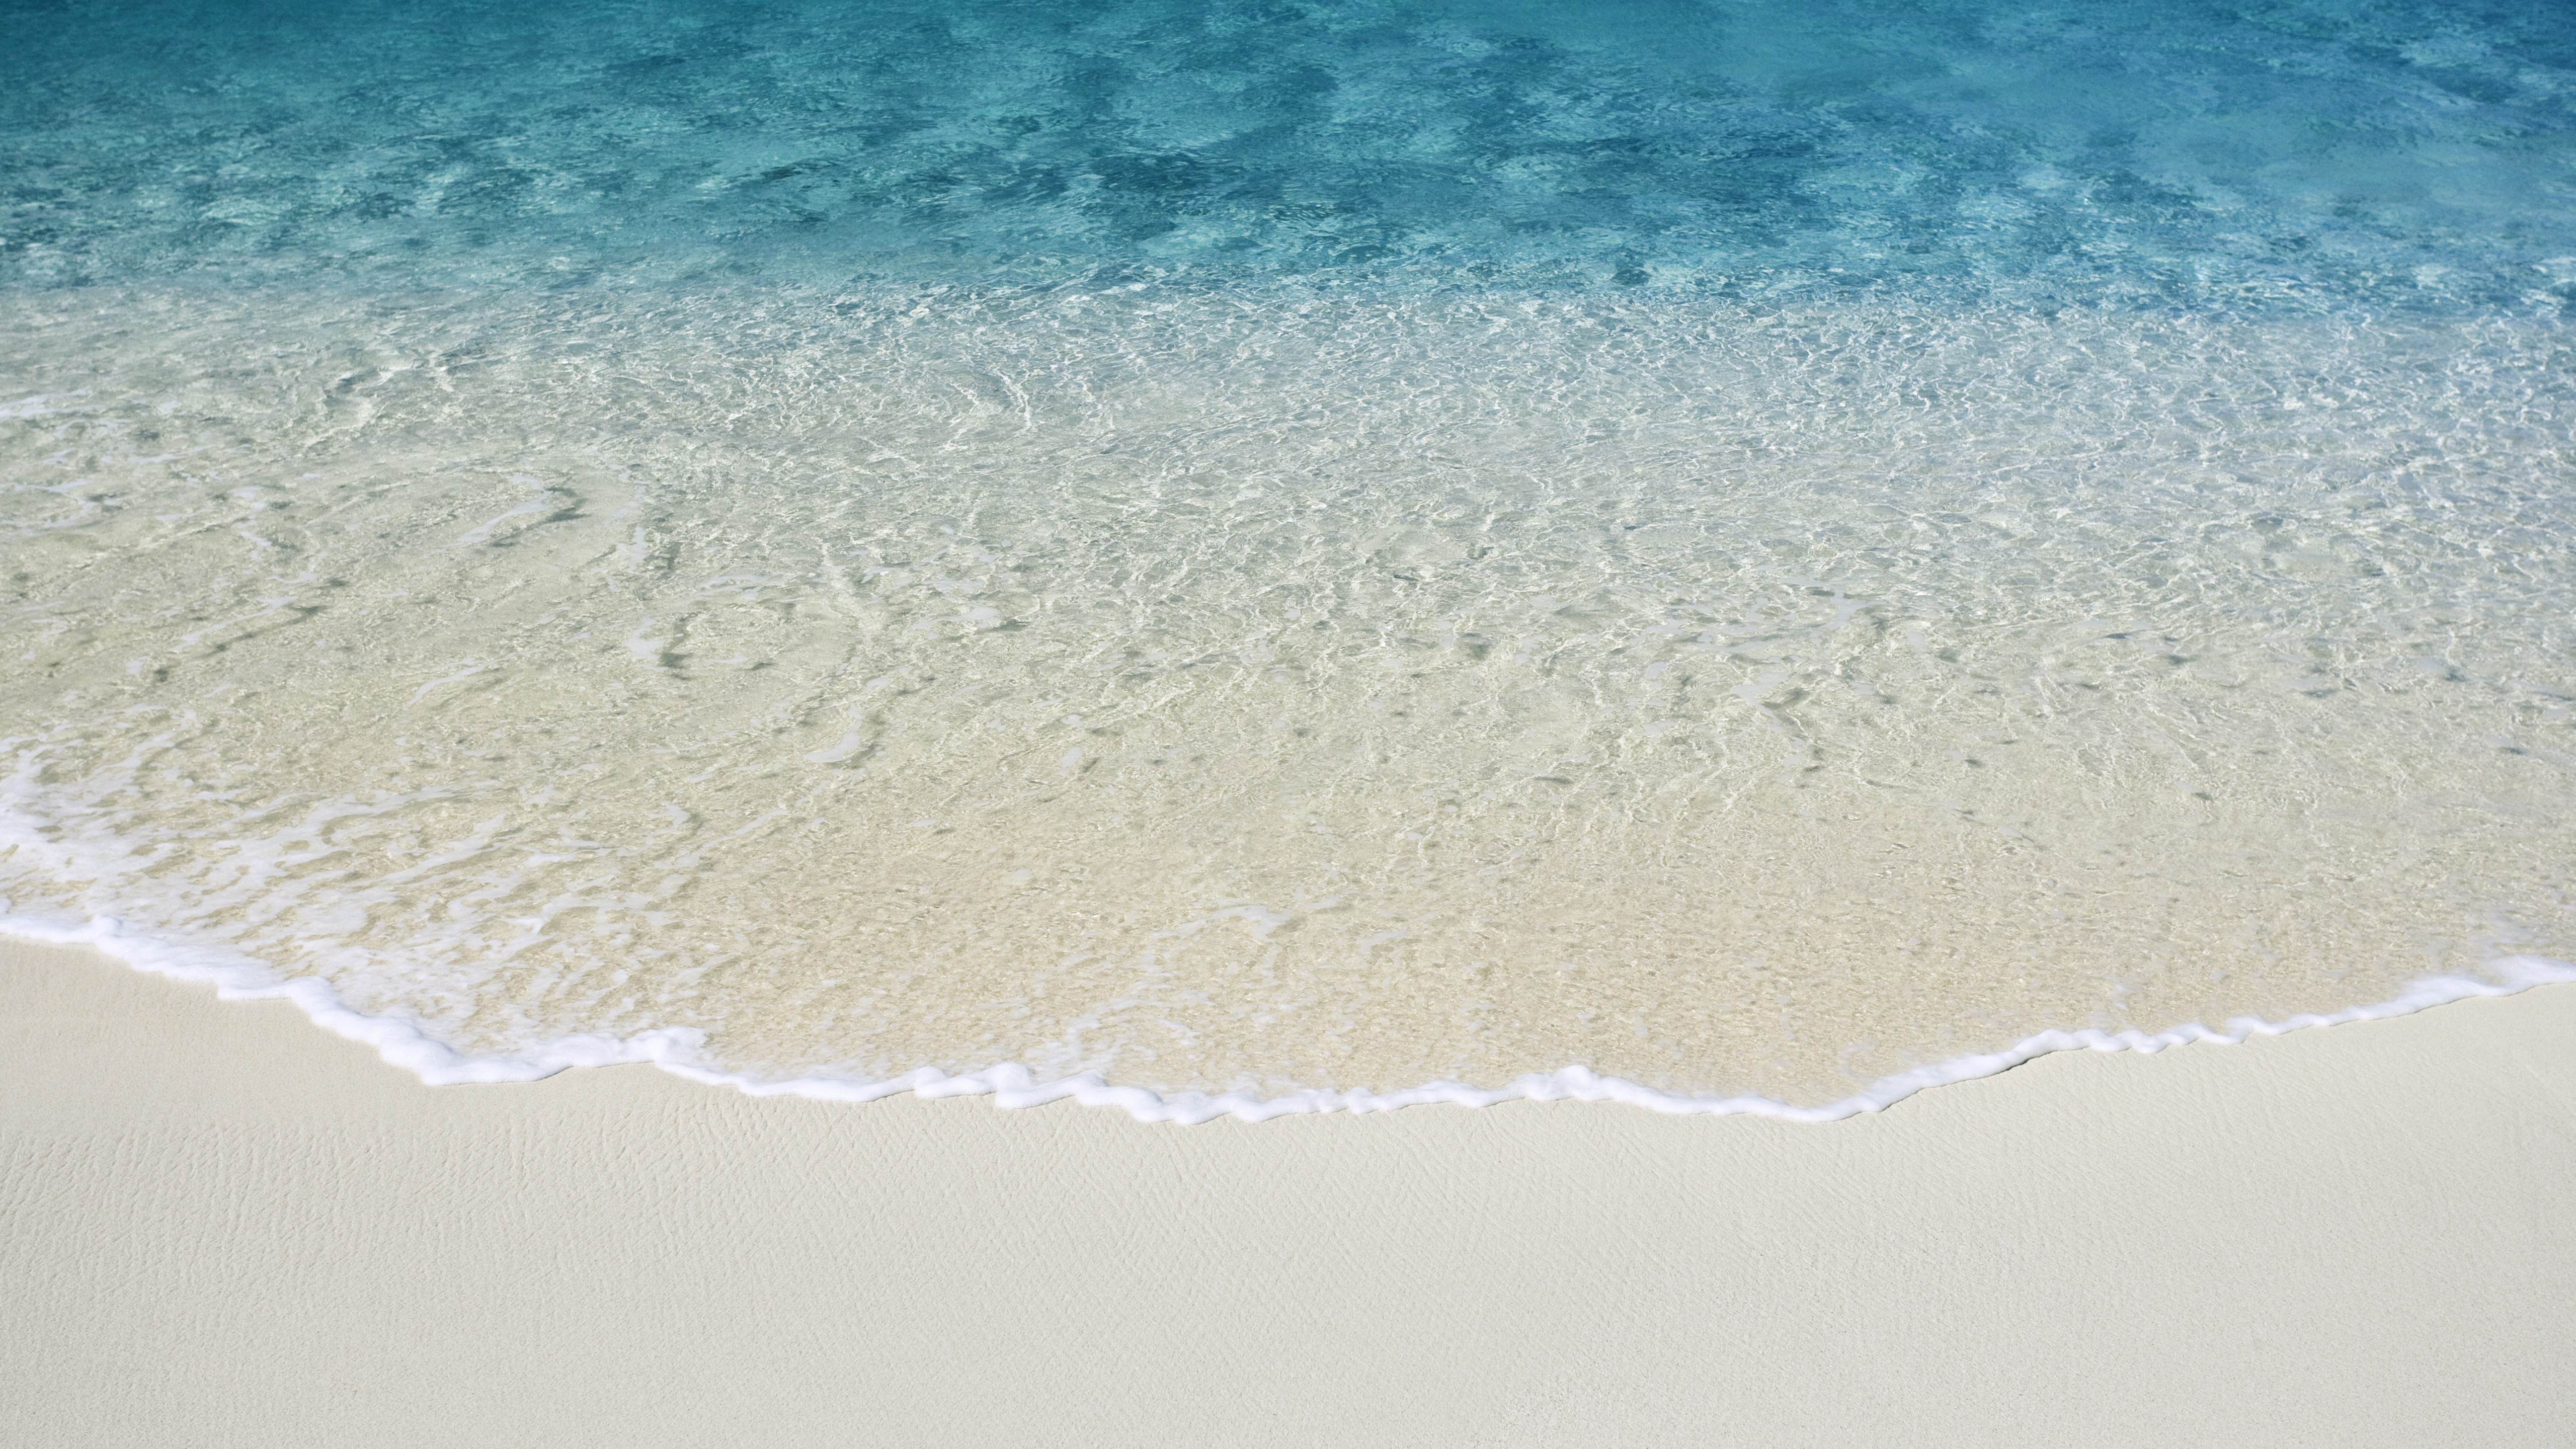 General 5120x2880 water sand beach